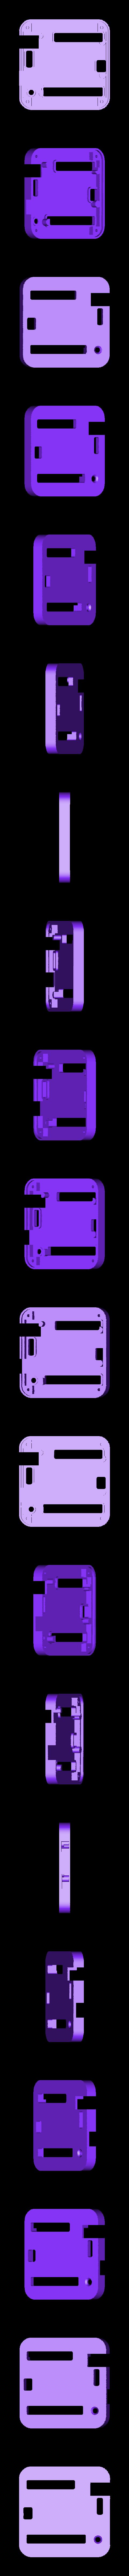 leonardo_case_slim_lid.stl Download free STL file 3D Printed Case for Arduino Uno, Leonardo. • 3D printing model, Lassaalk